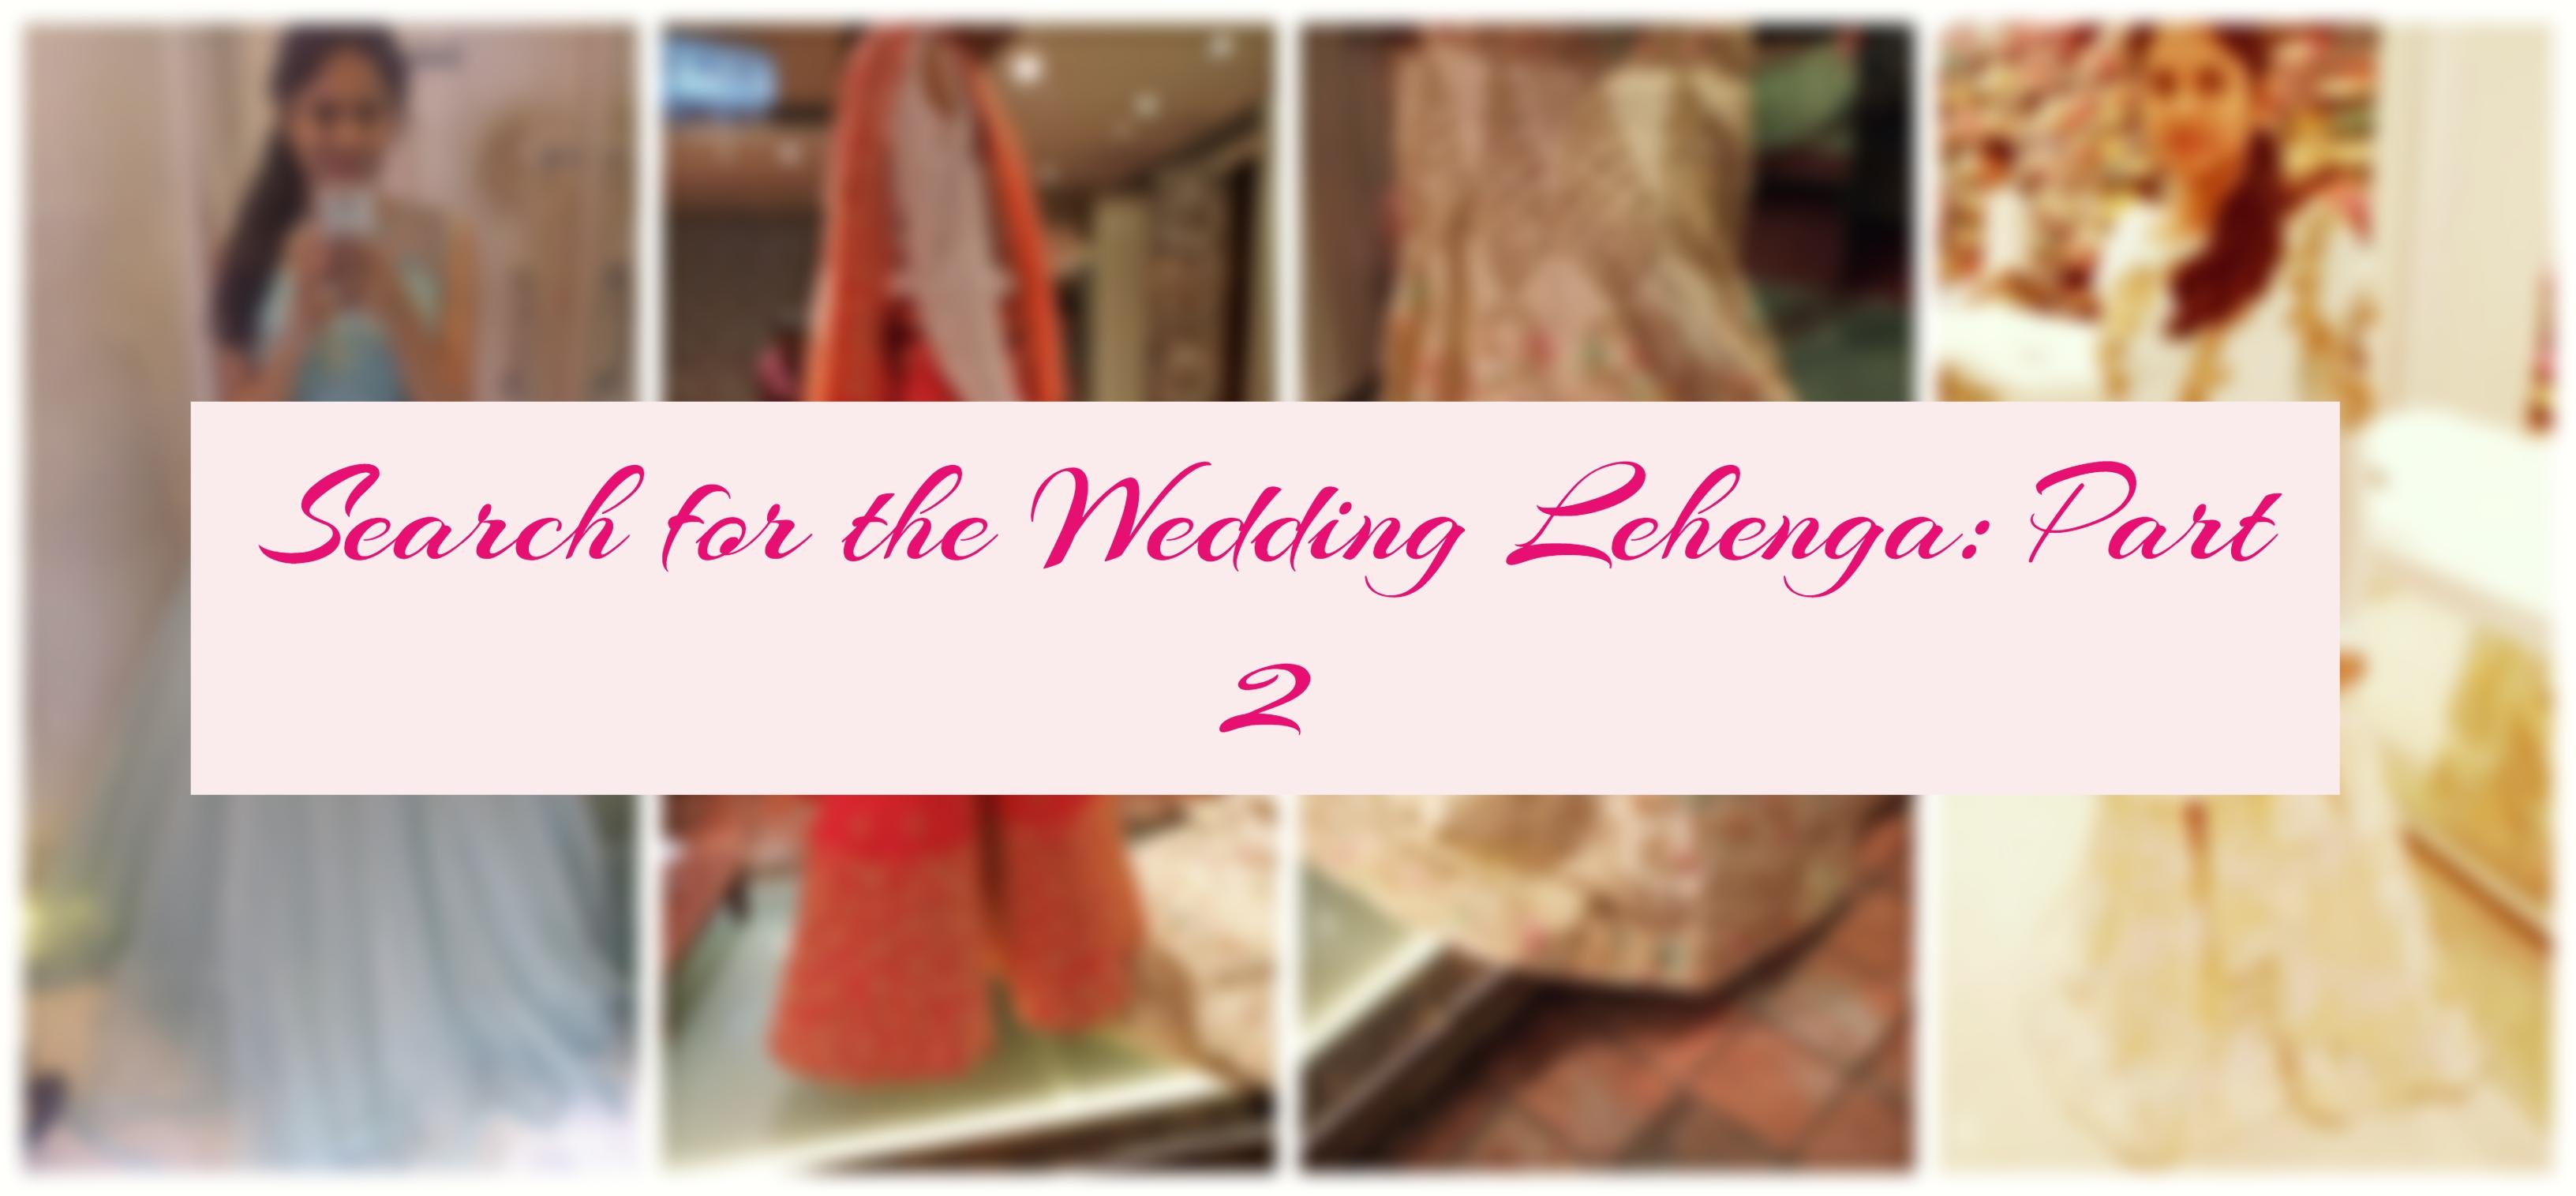 Search for the wedding lehenga